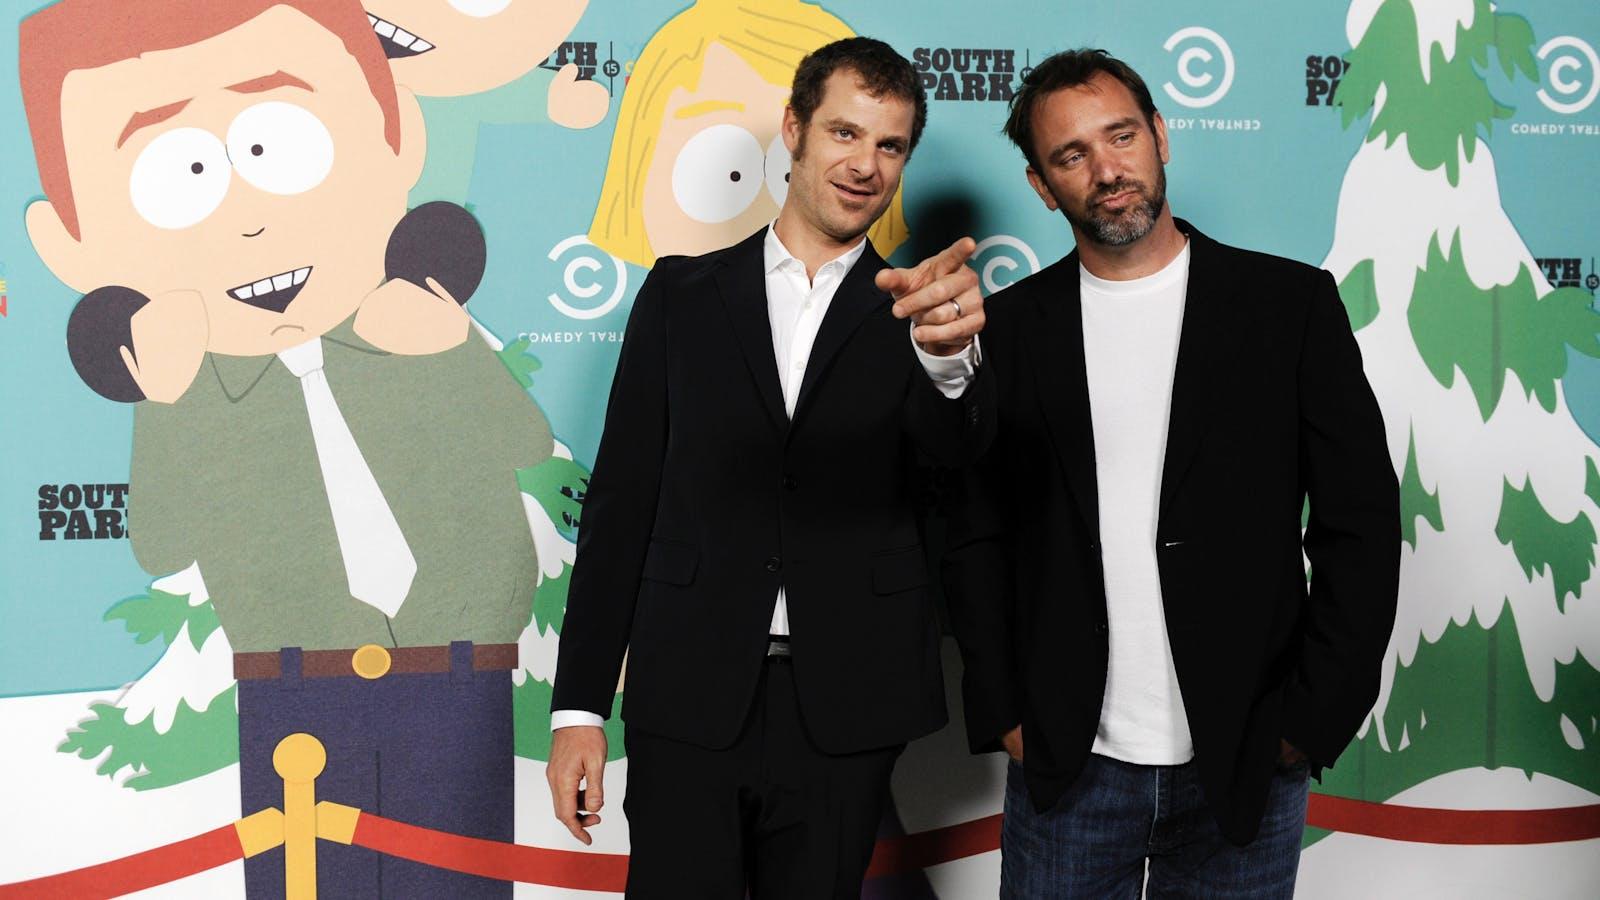 South Park's creators, Matt Stone and Trey Parker. Photo by AP